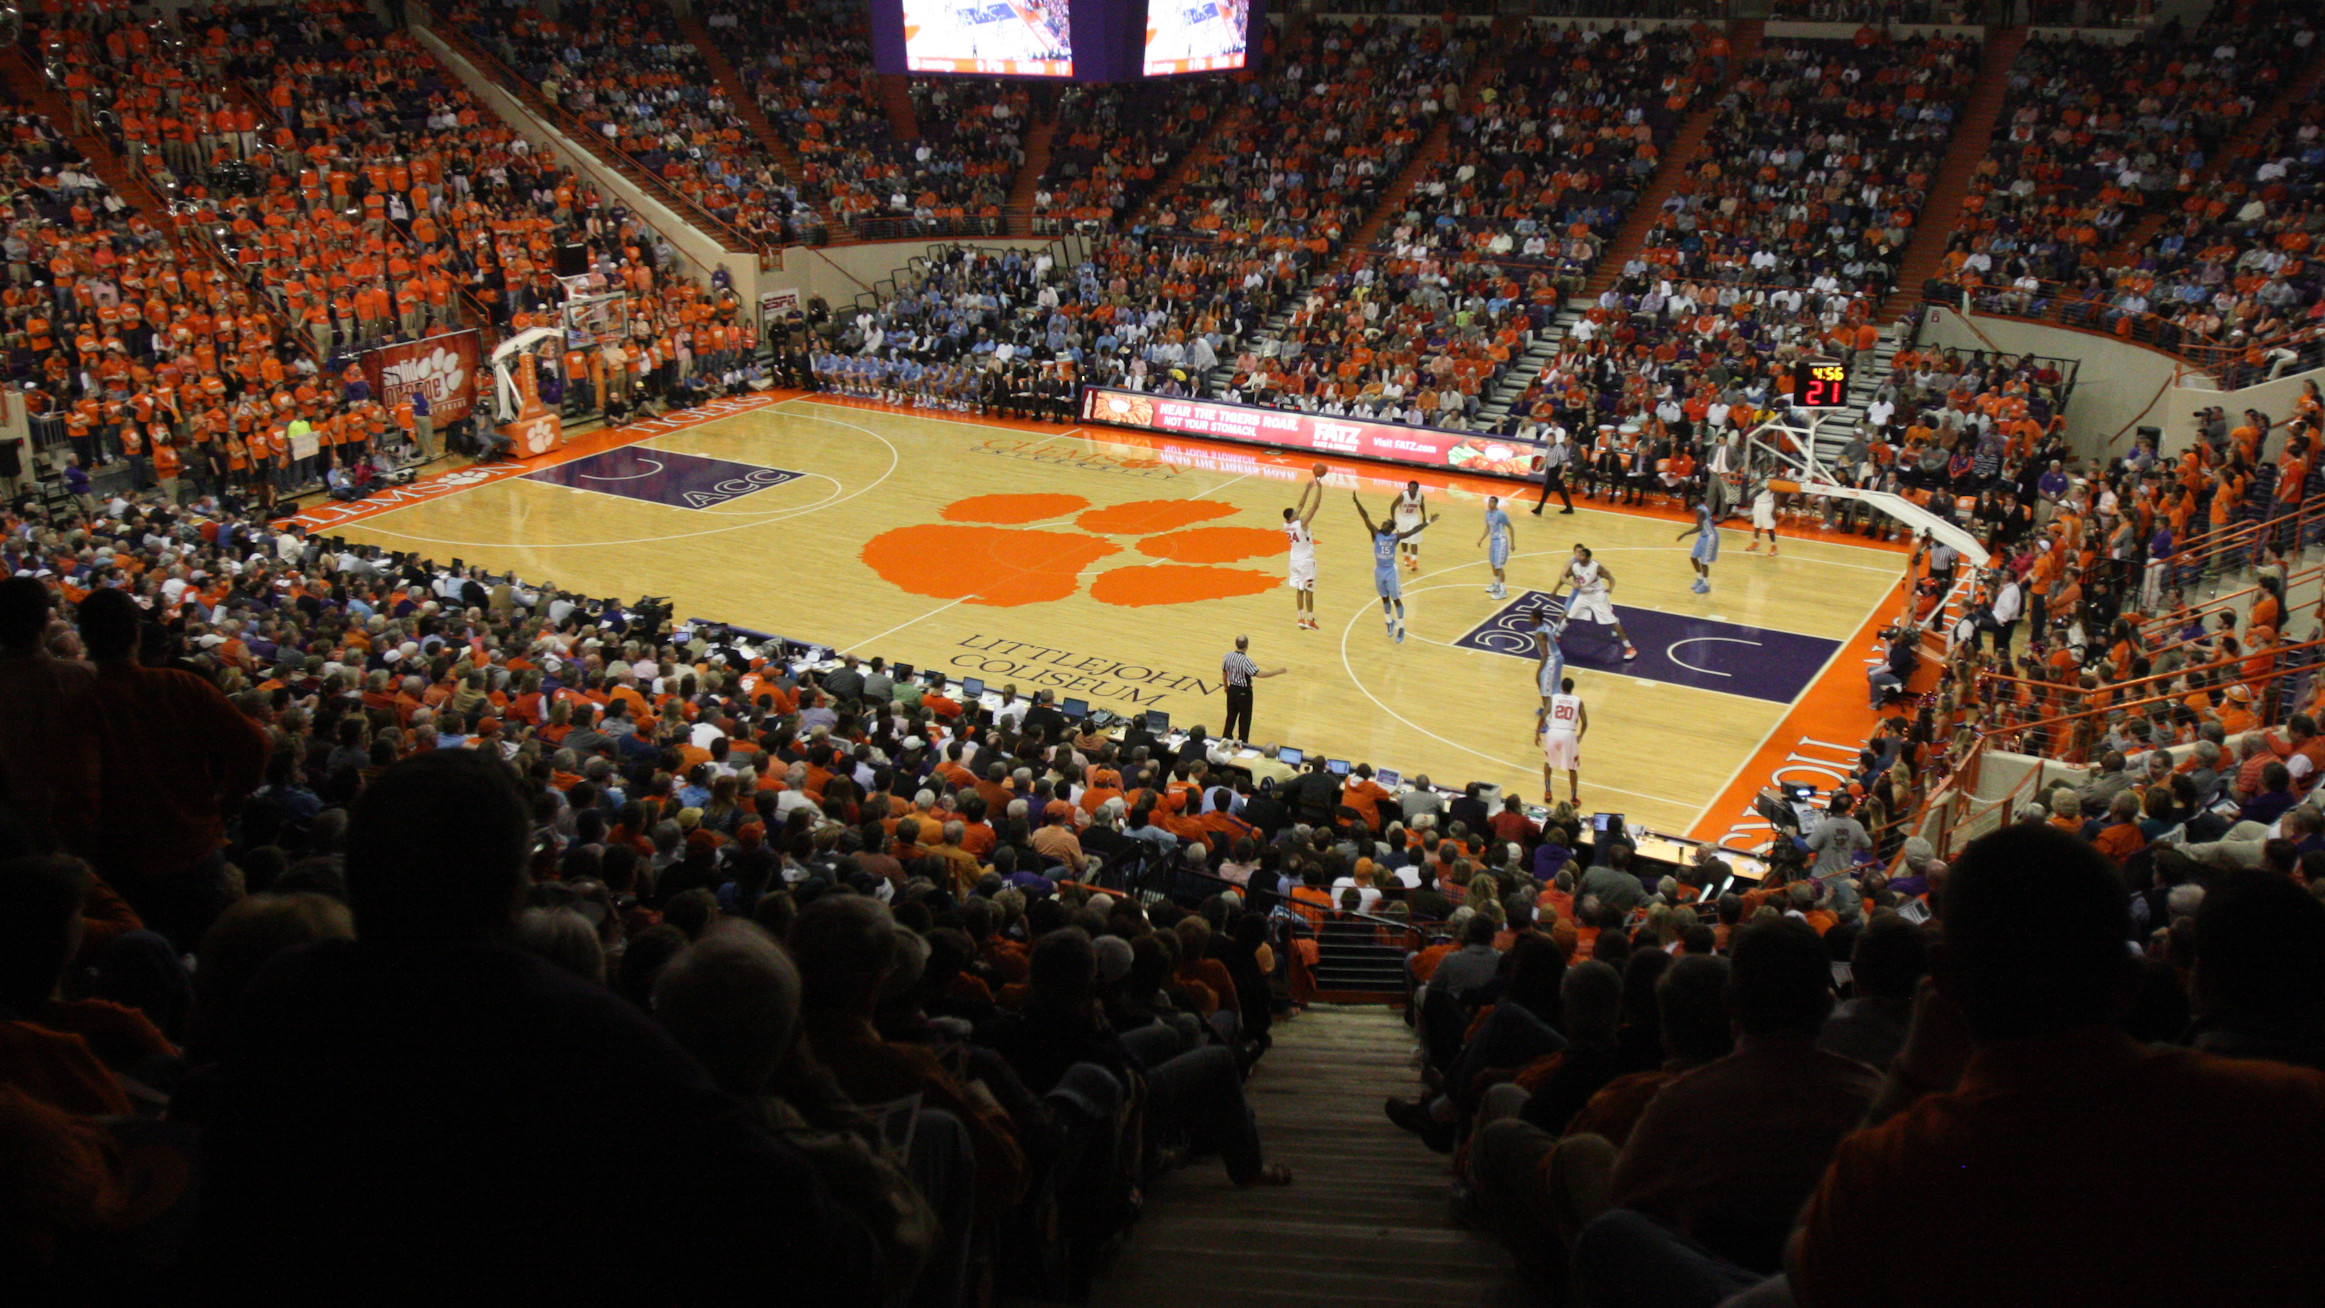 Tickets Sold Out for Clemson vs. Duke Men's Basketball Game